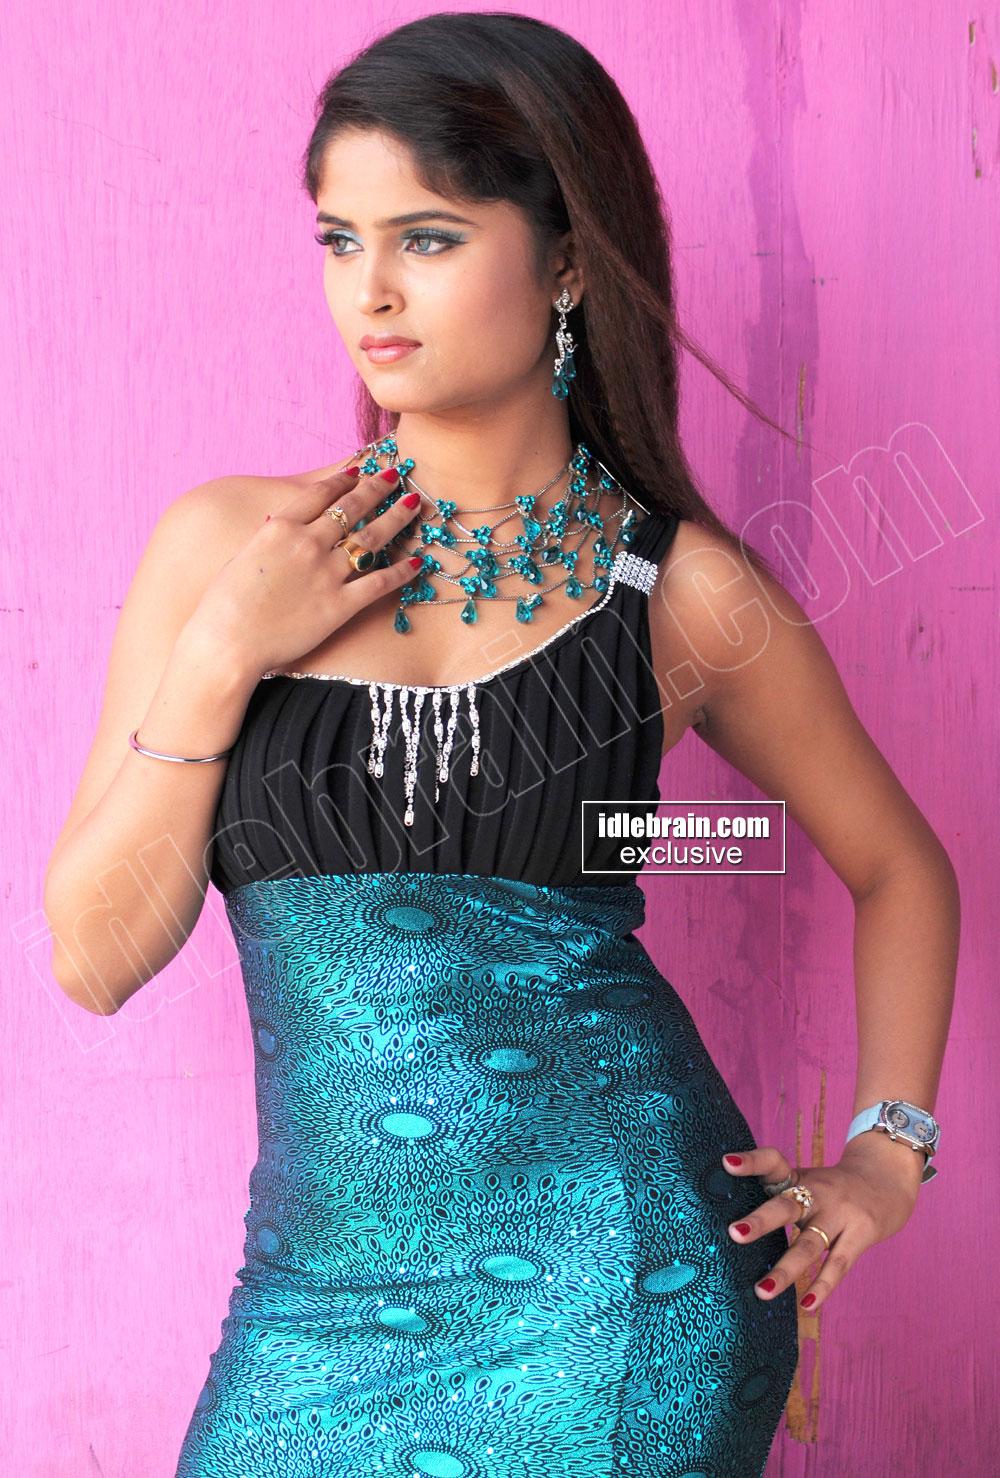 Indian Garam Masala: TELUGU HOT MASALA Actress Aphiya